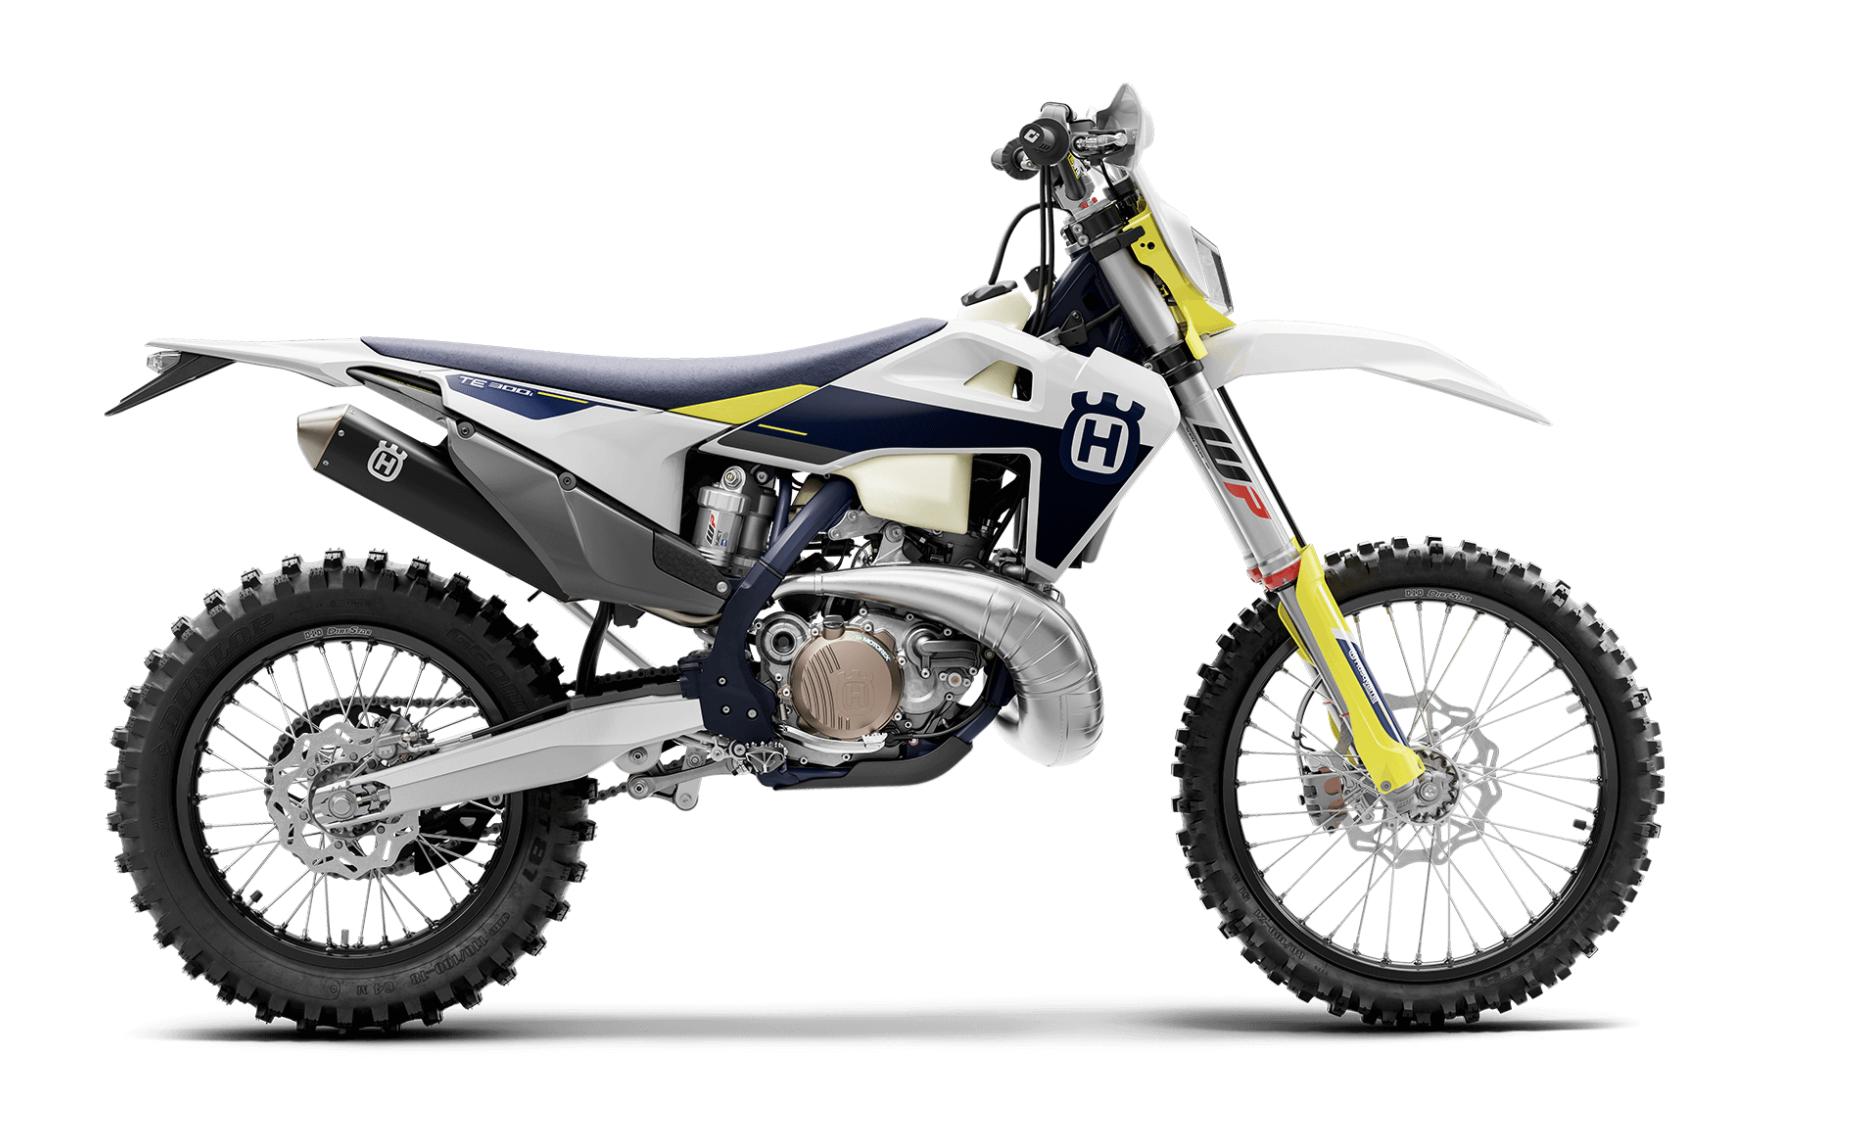 2021 Husqvarna Enduro Adult dirt bike